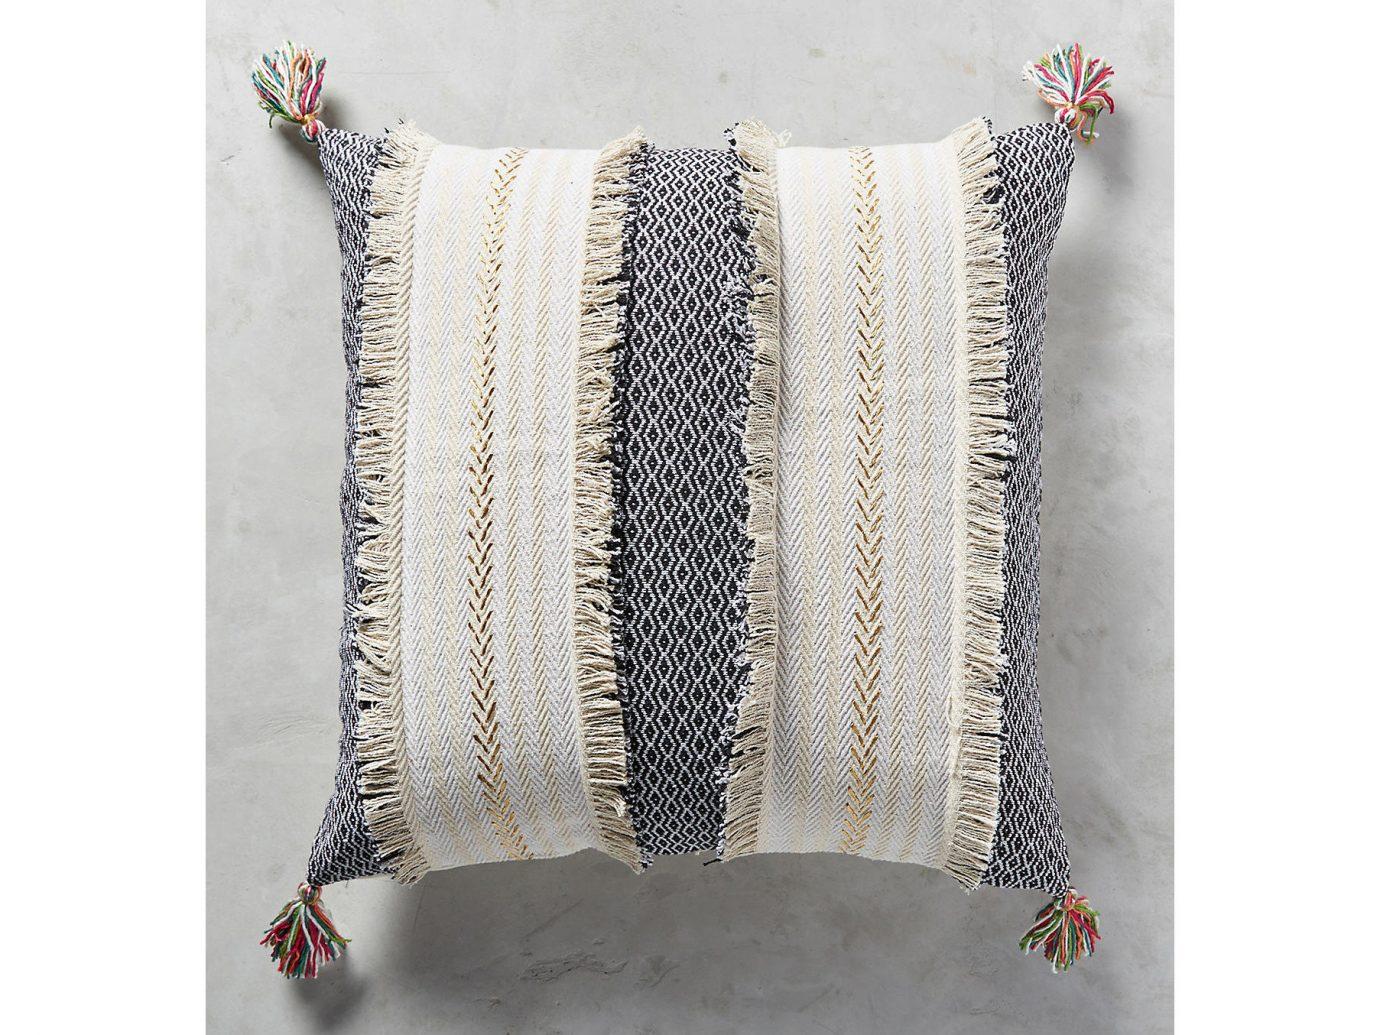 Amsterdam Style + Design The Netherlands Travel Shop throw pillow cushion pillow linens